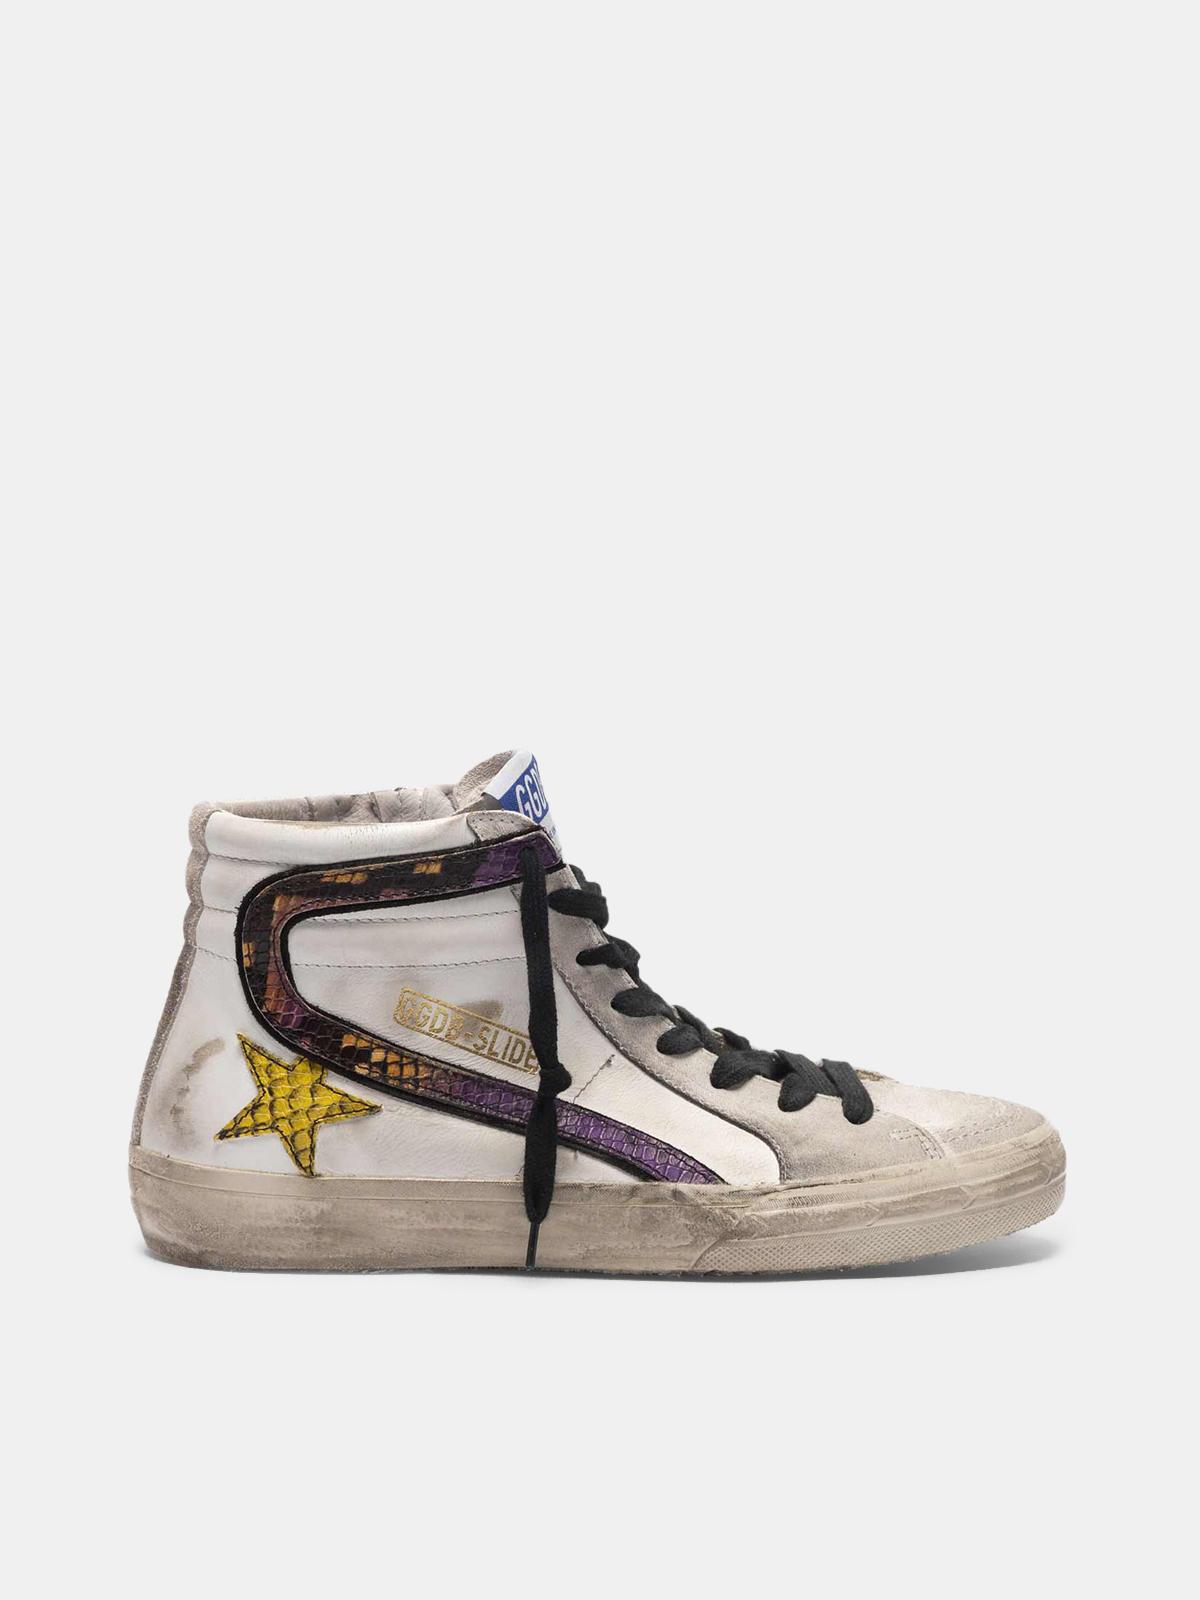 Golden Goose - Slide sneakers with snake-print logo in